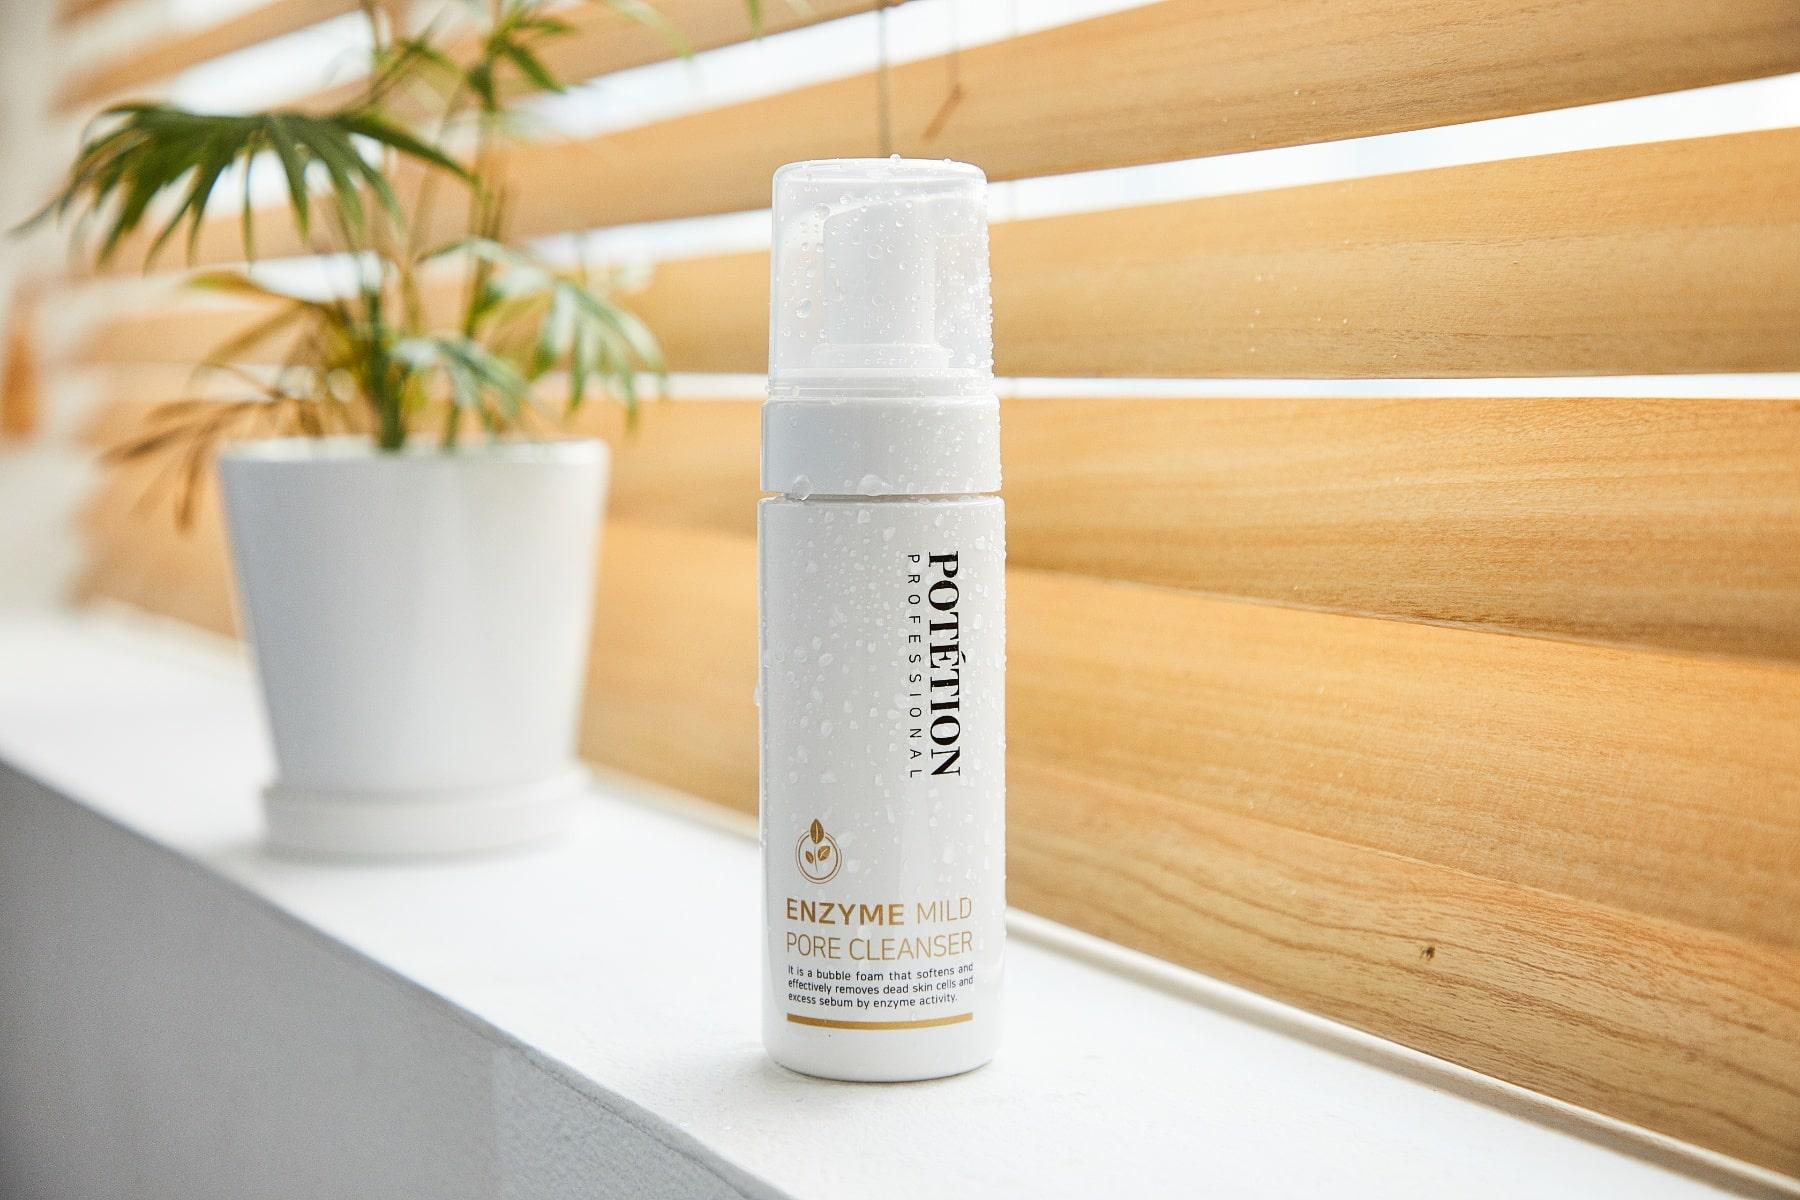 Ензимна очищуюча пінка Potetion Enzyme Mild Pore Cleanser